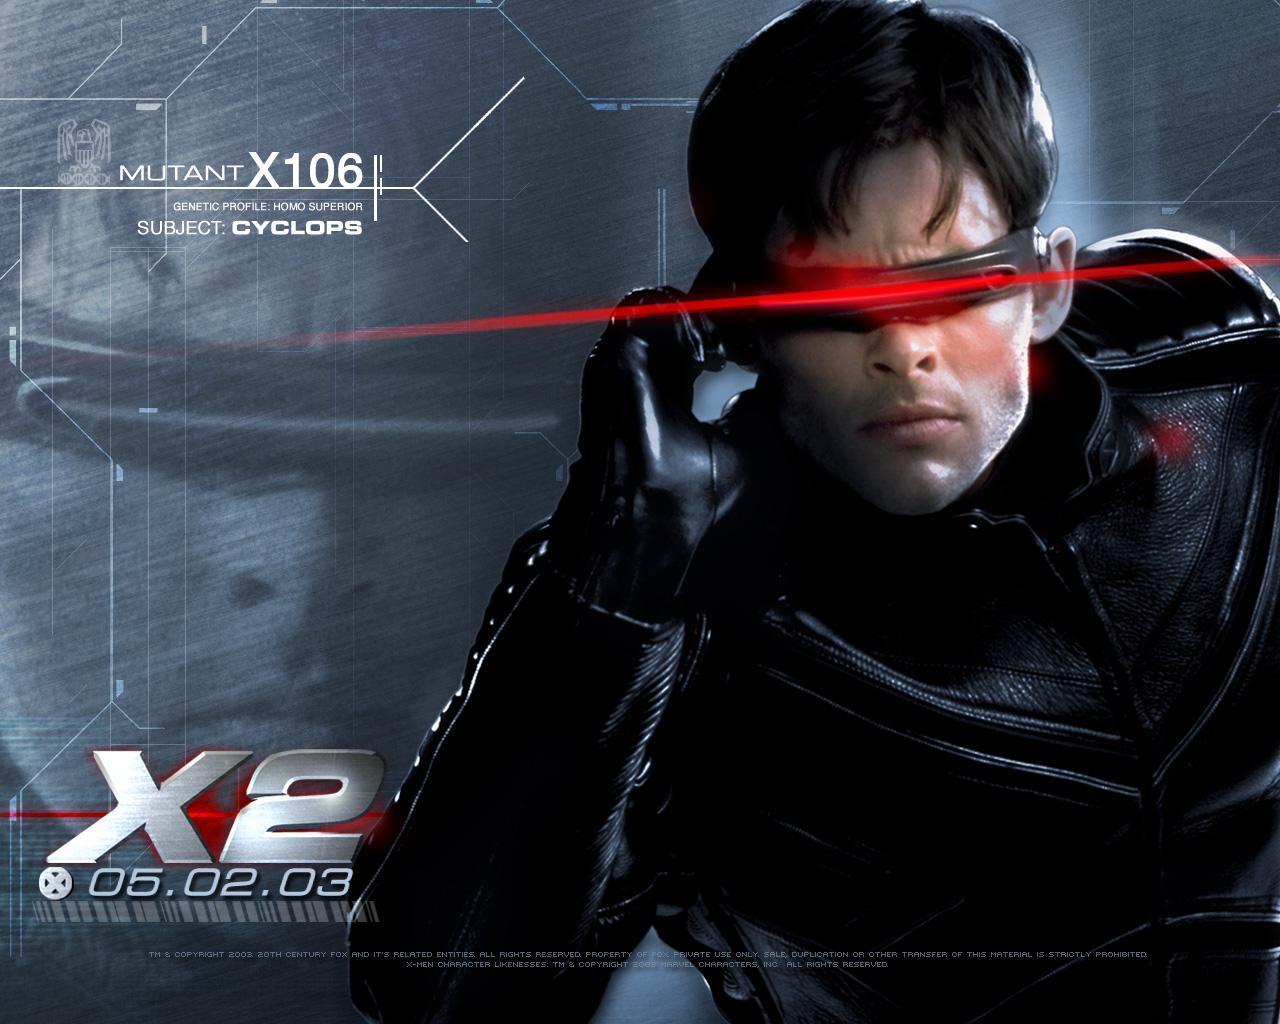 cyclops film